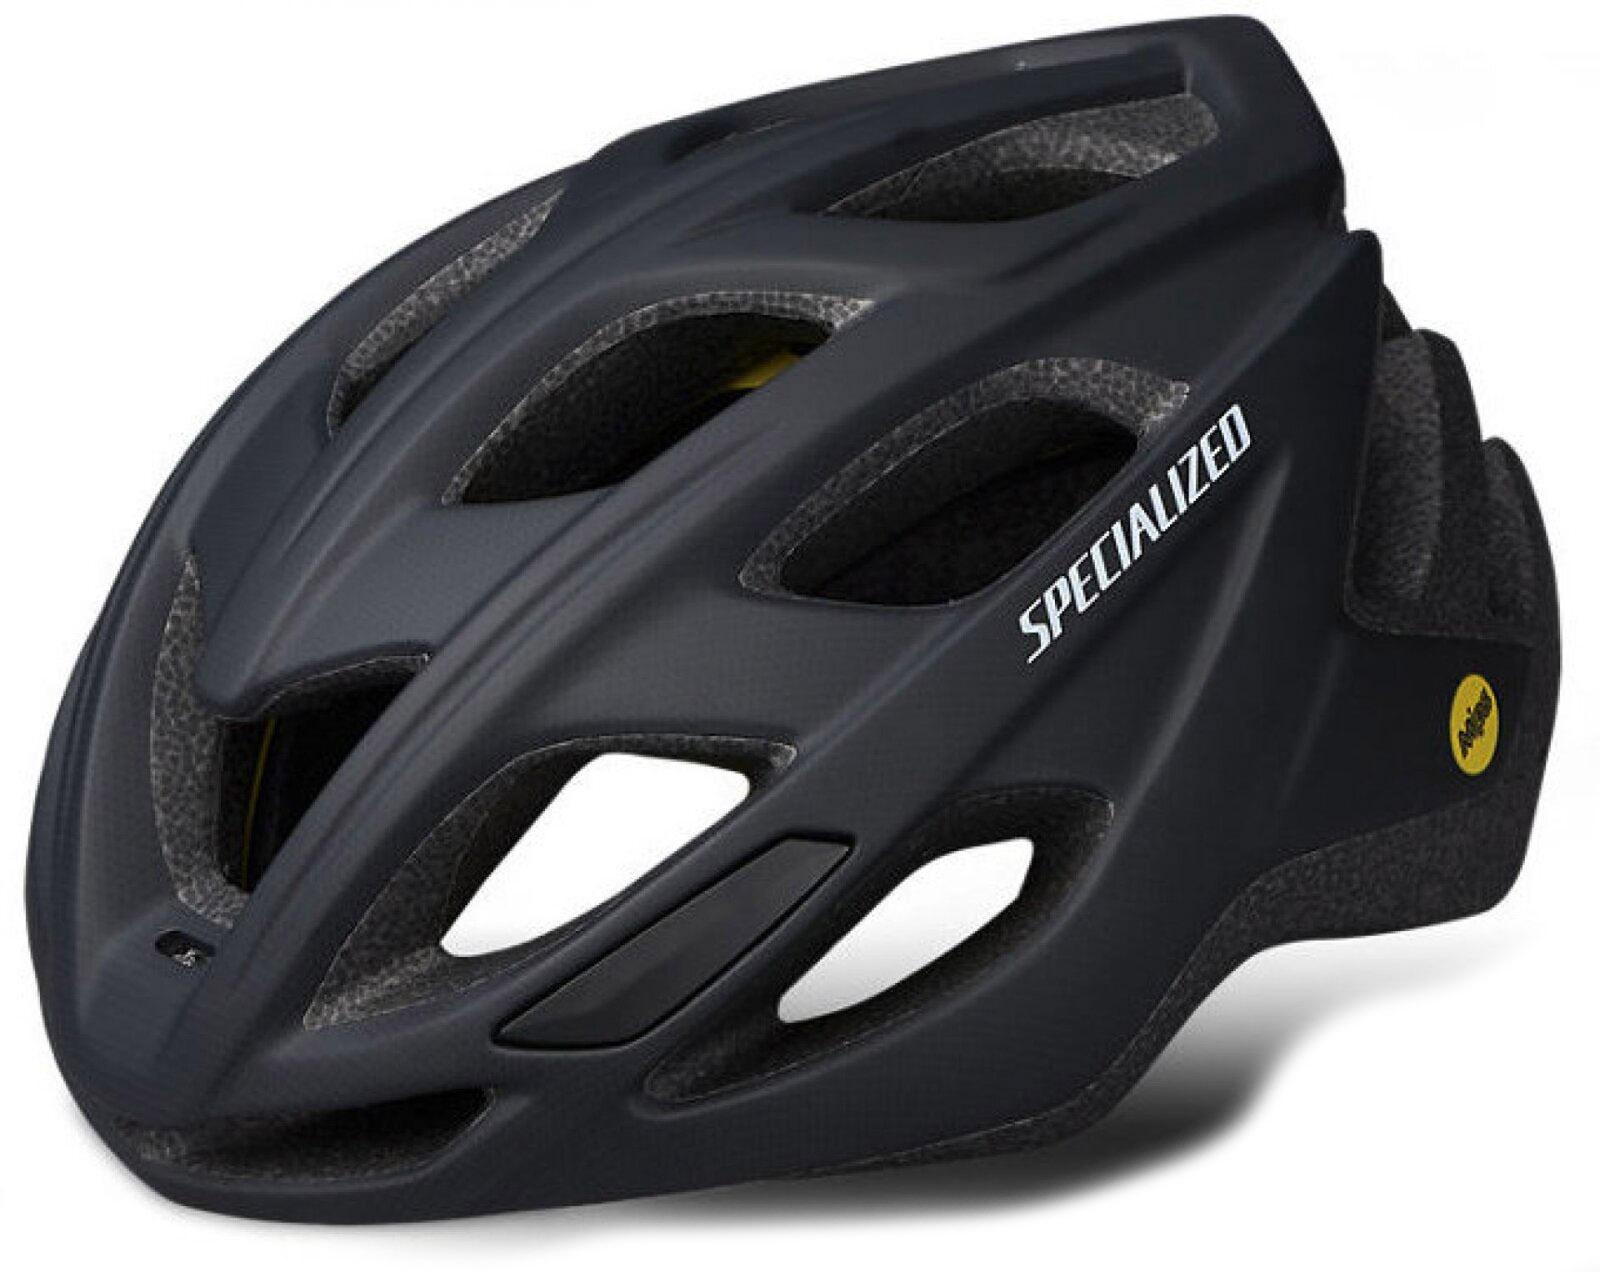 Specialized Chamonix Mips cykelhjelm - Sort